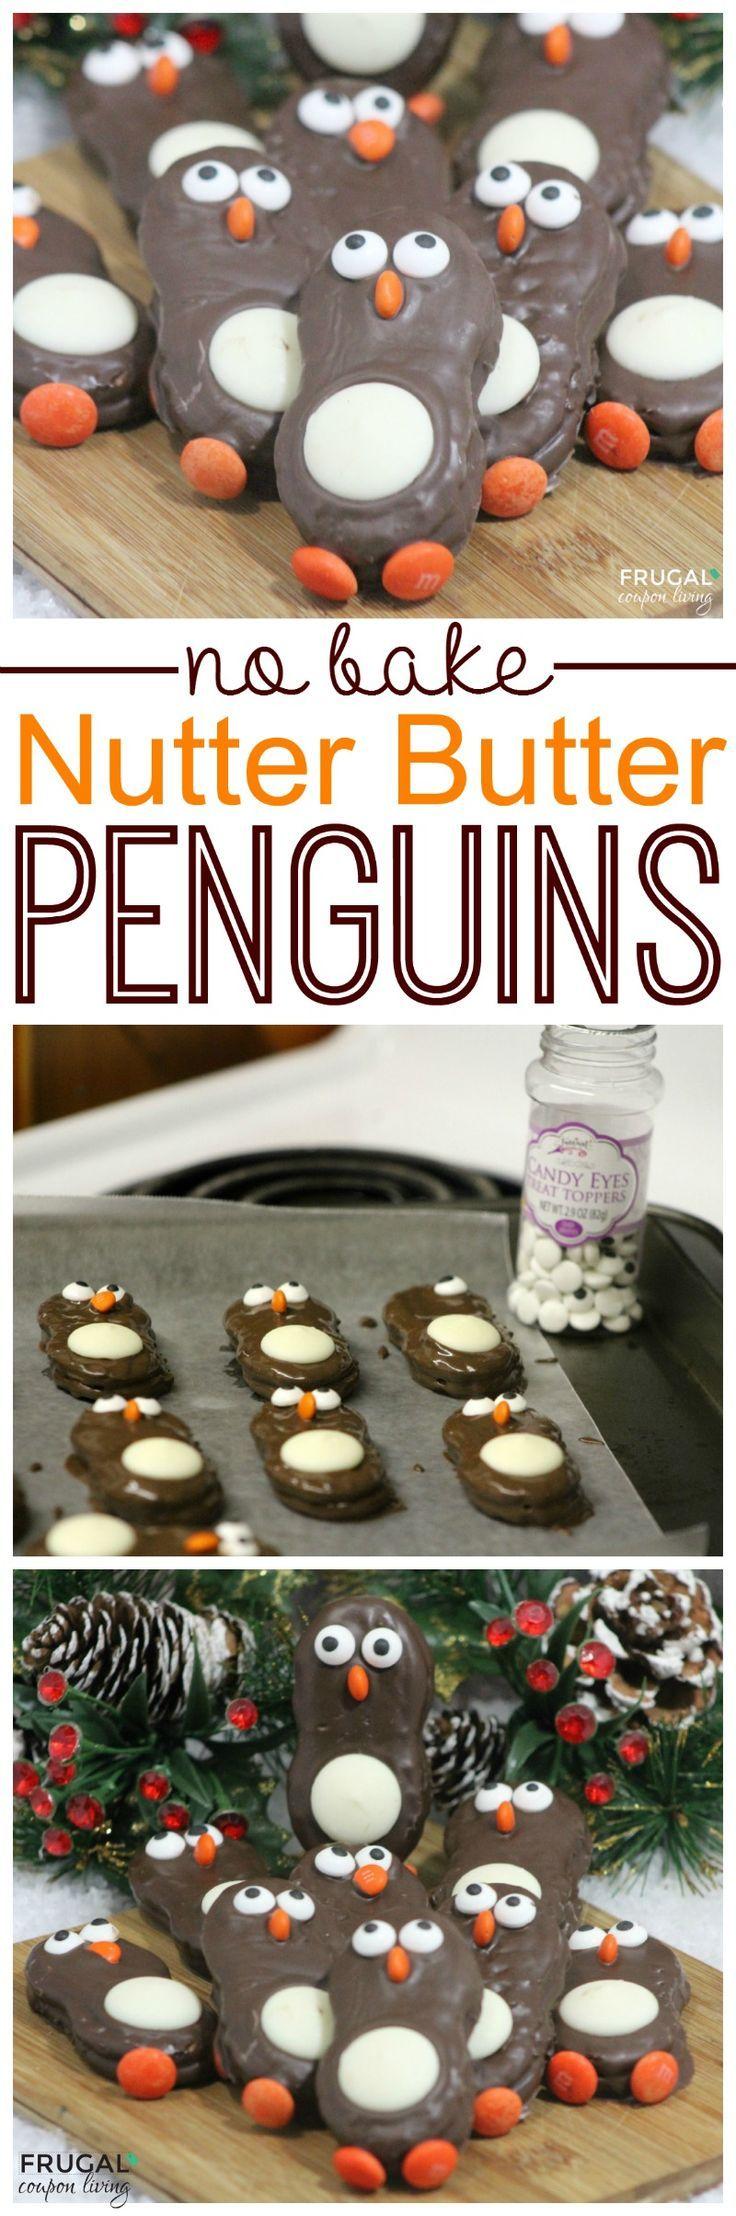 Food | Nutter Butter Penguins by Frugal Coupon Living